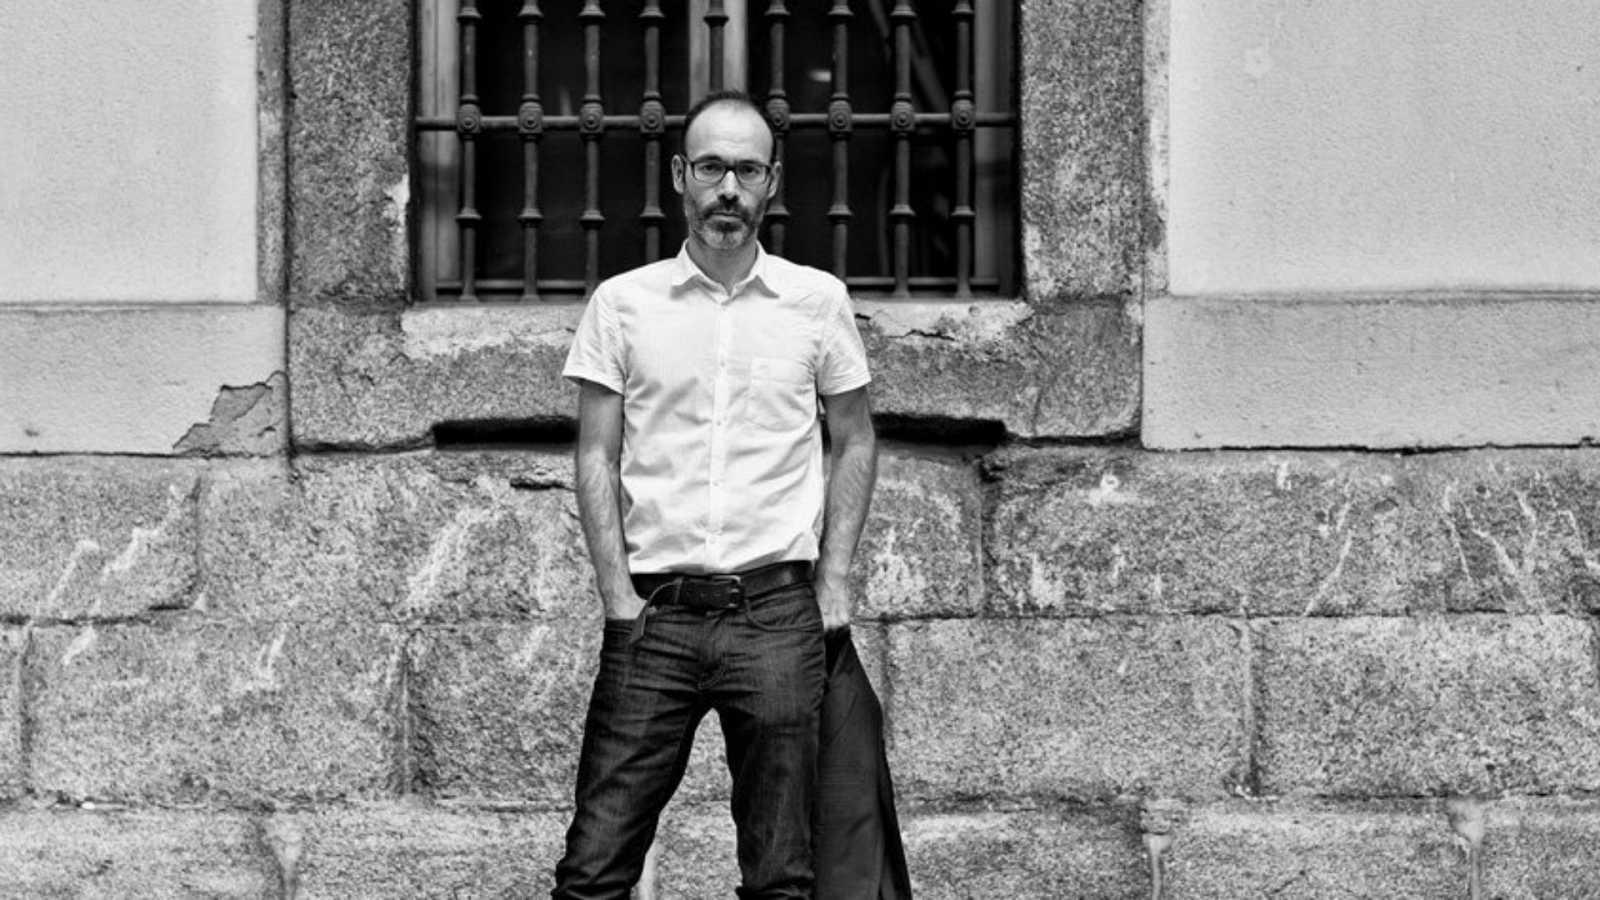 Libros de arena - Gabi Martínez - 27/08/20 - escuchar ahora